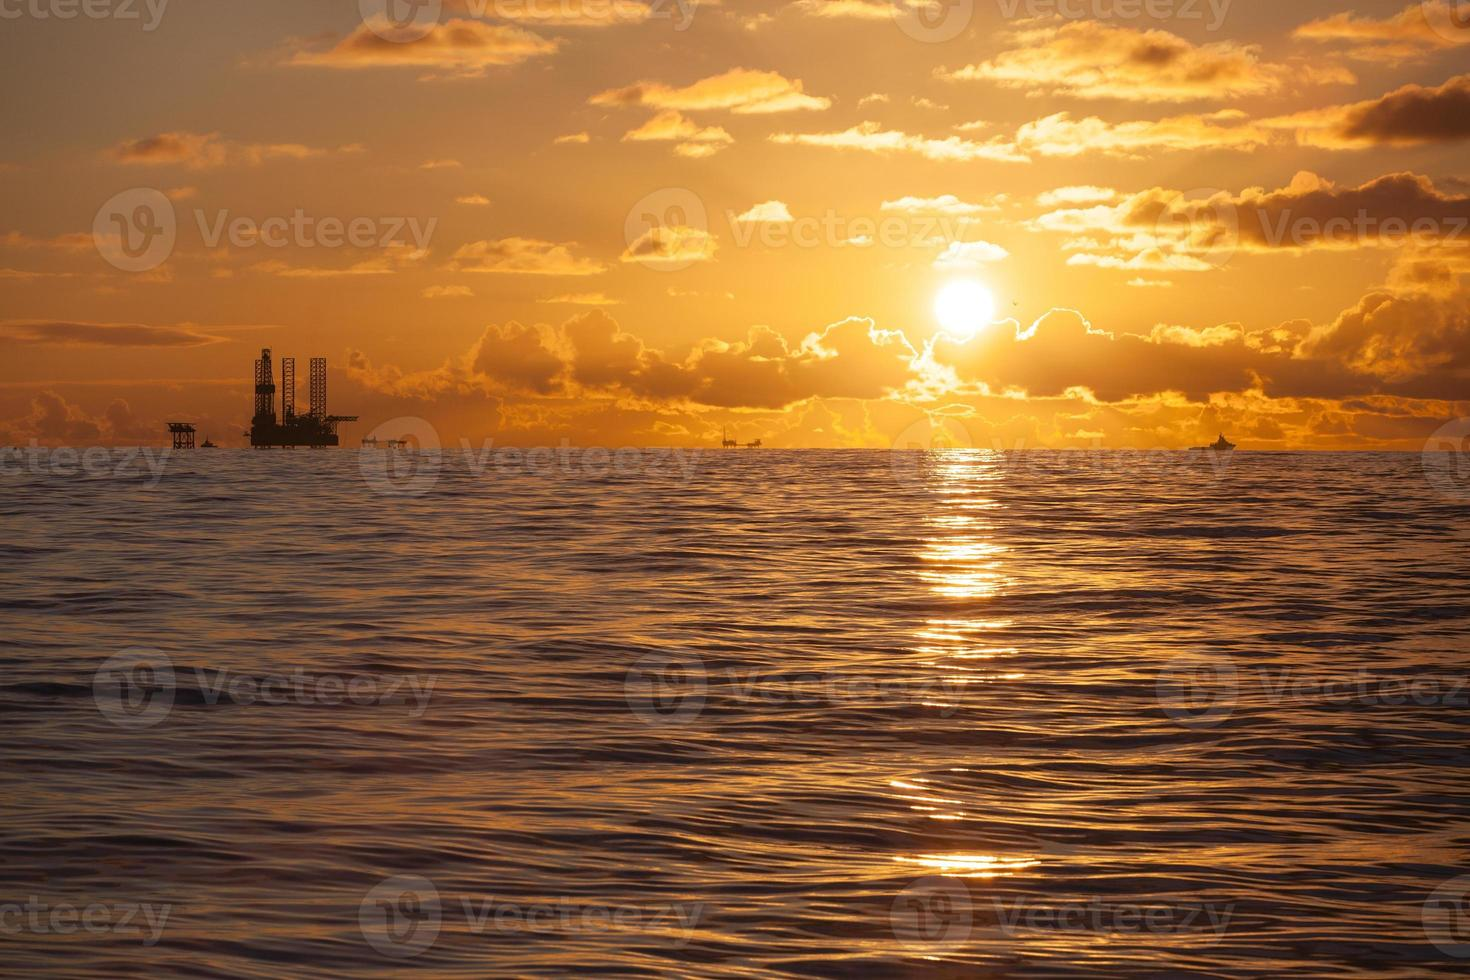 Oil rig on the North Sea photo